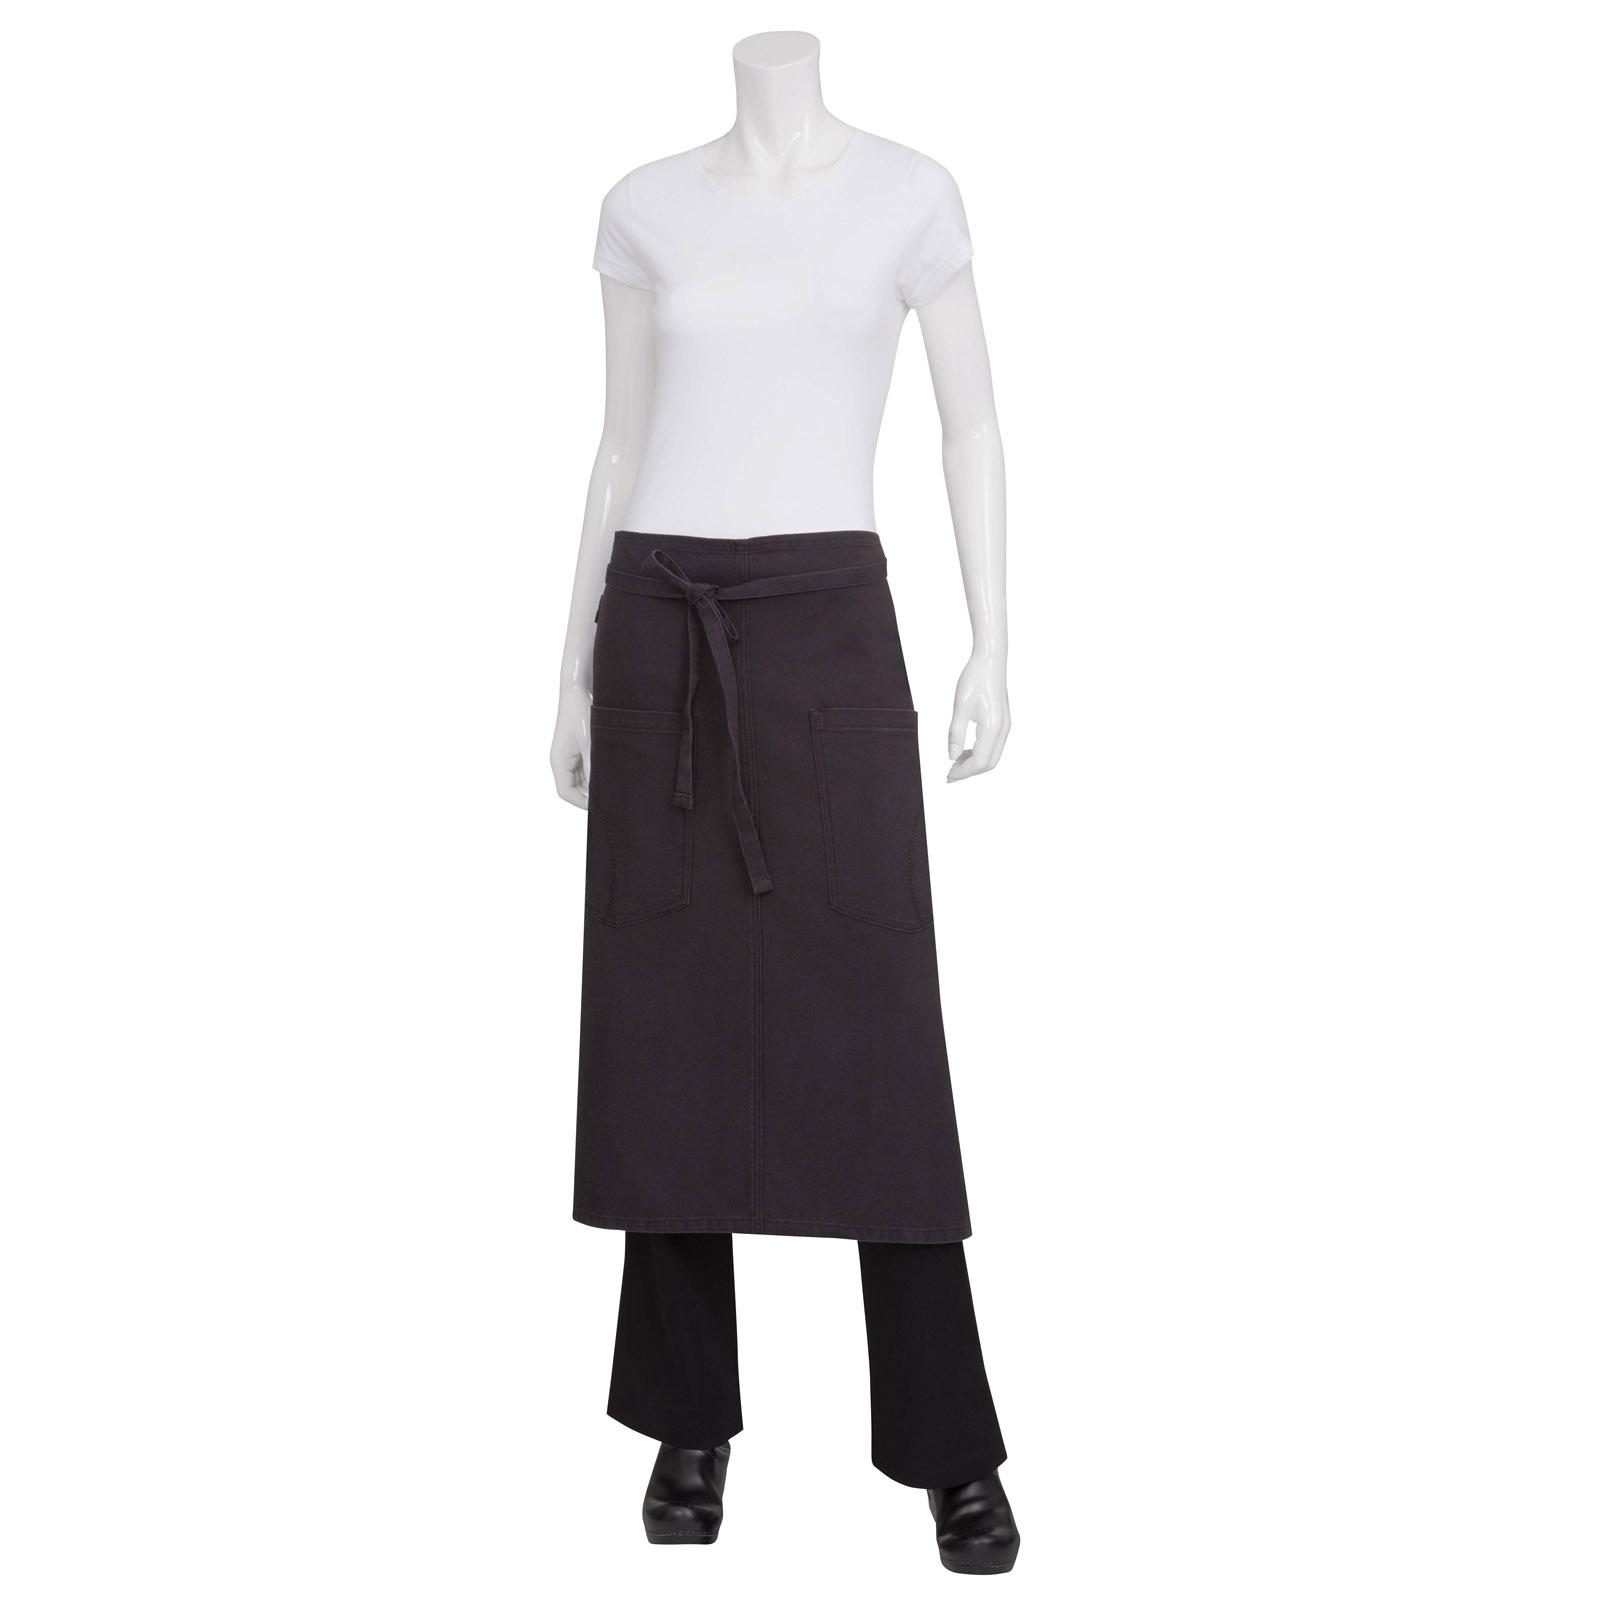 Chef Works ALWKV023SGY0 waist apron